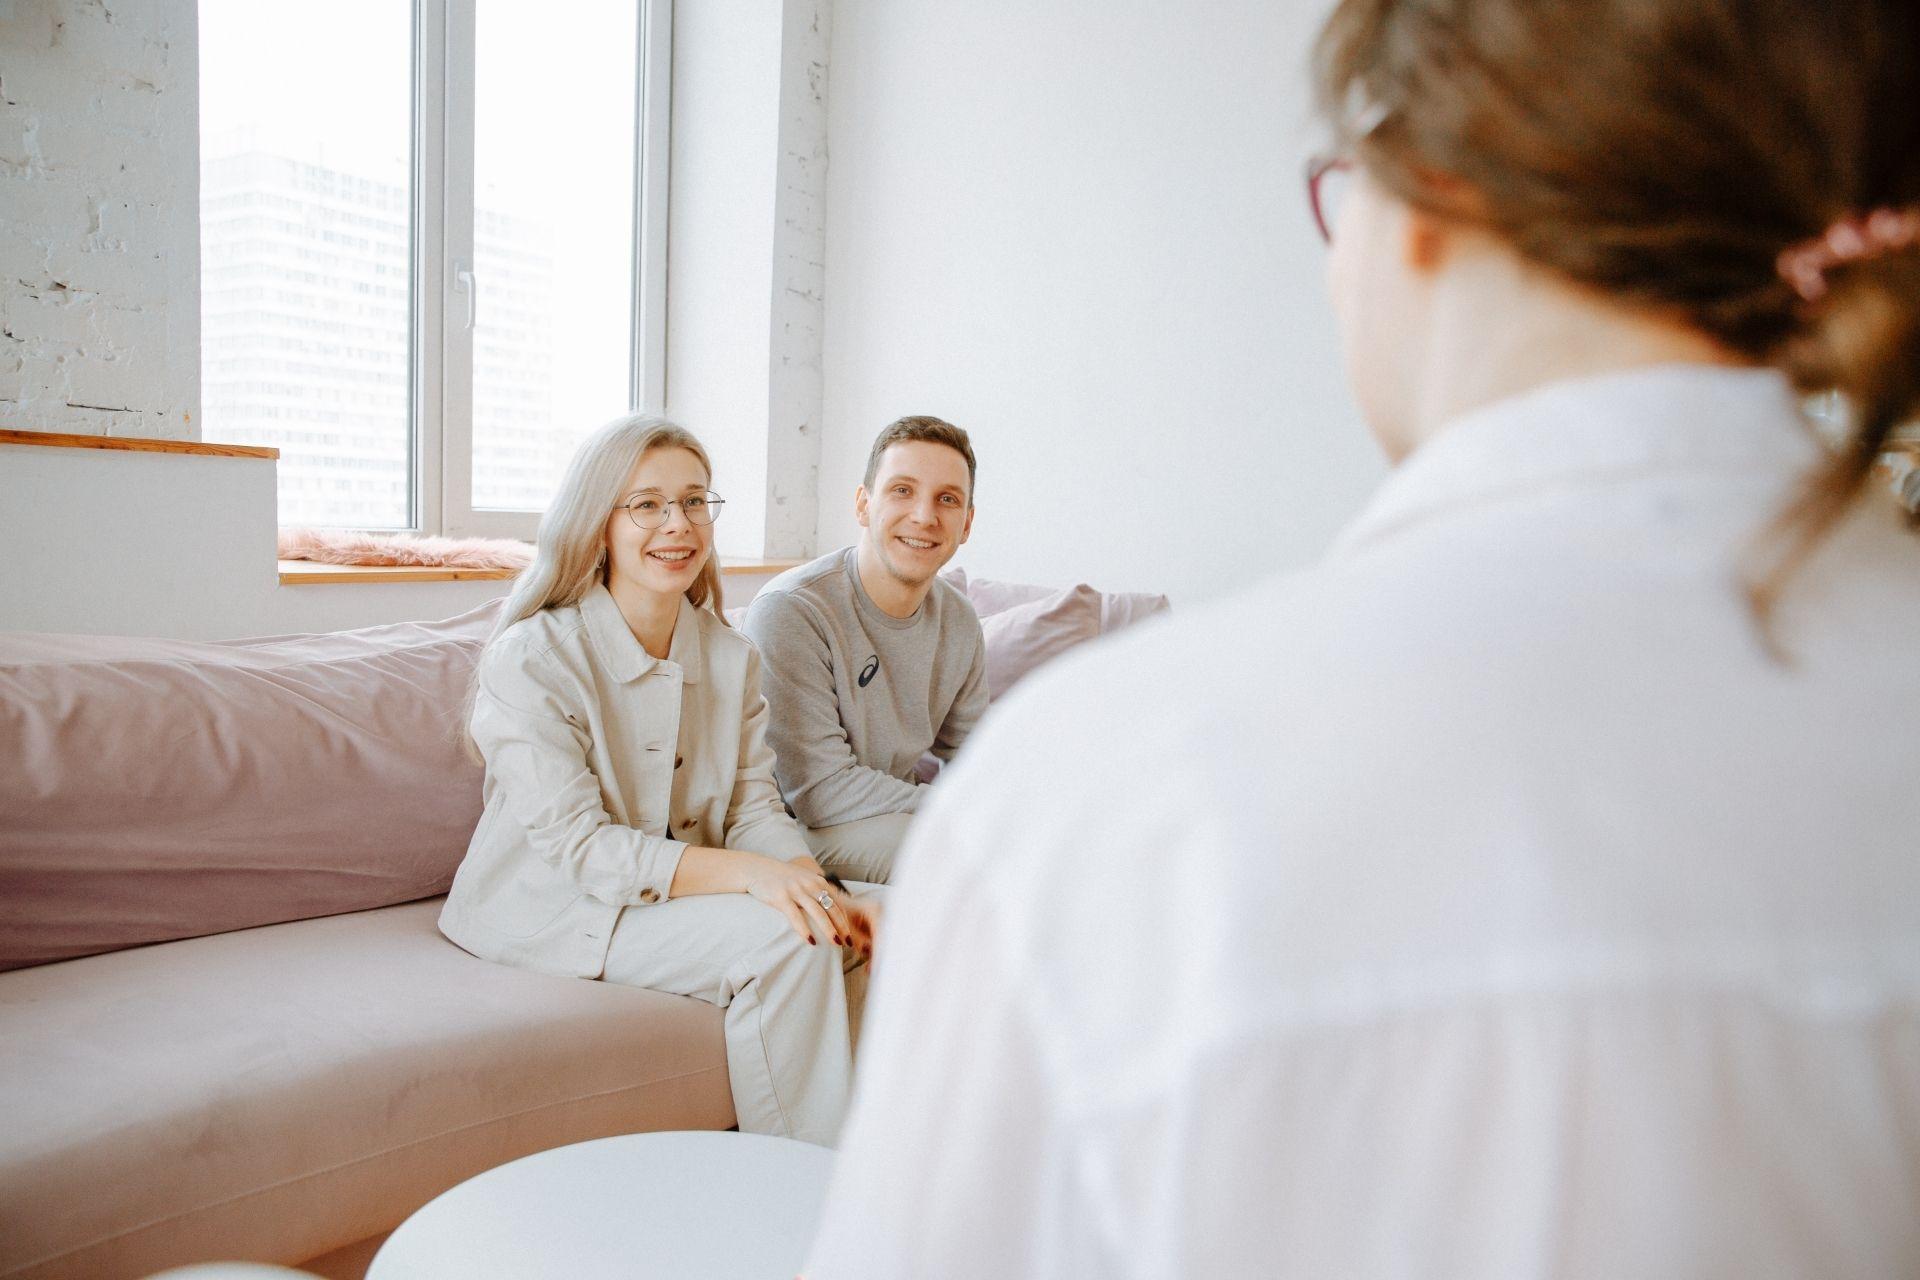 how to fix your marriage when trust is broken